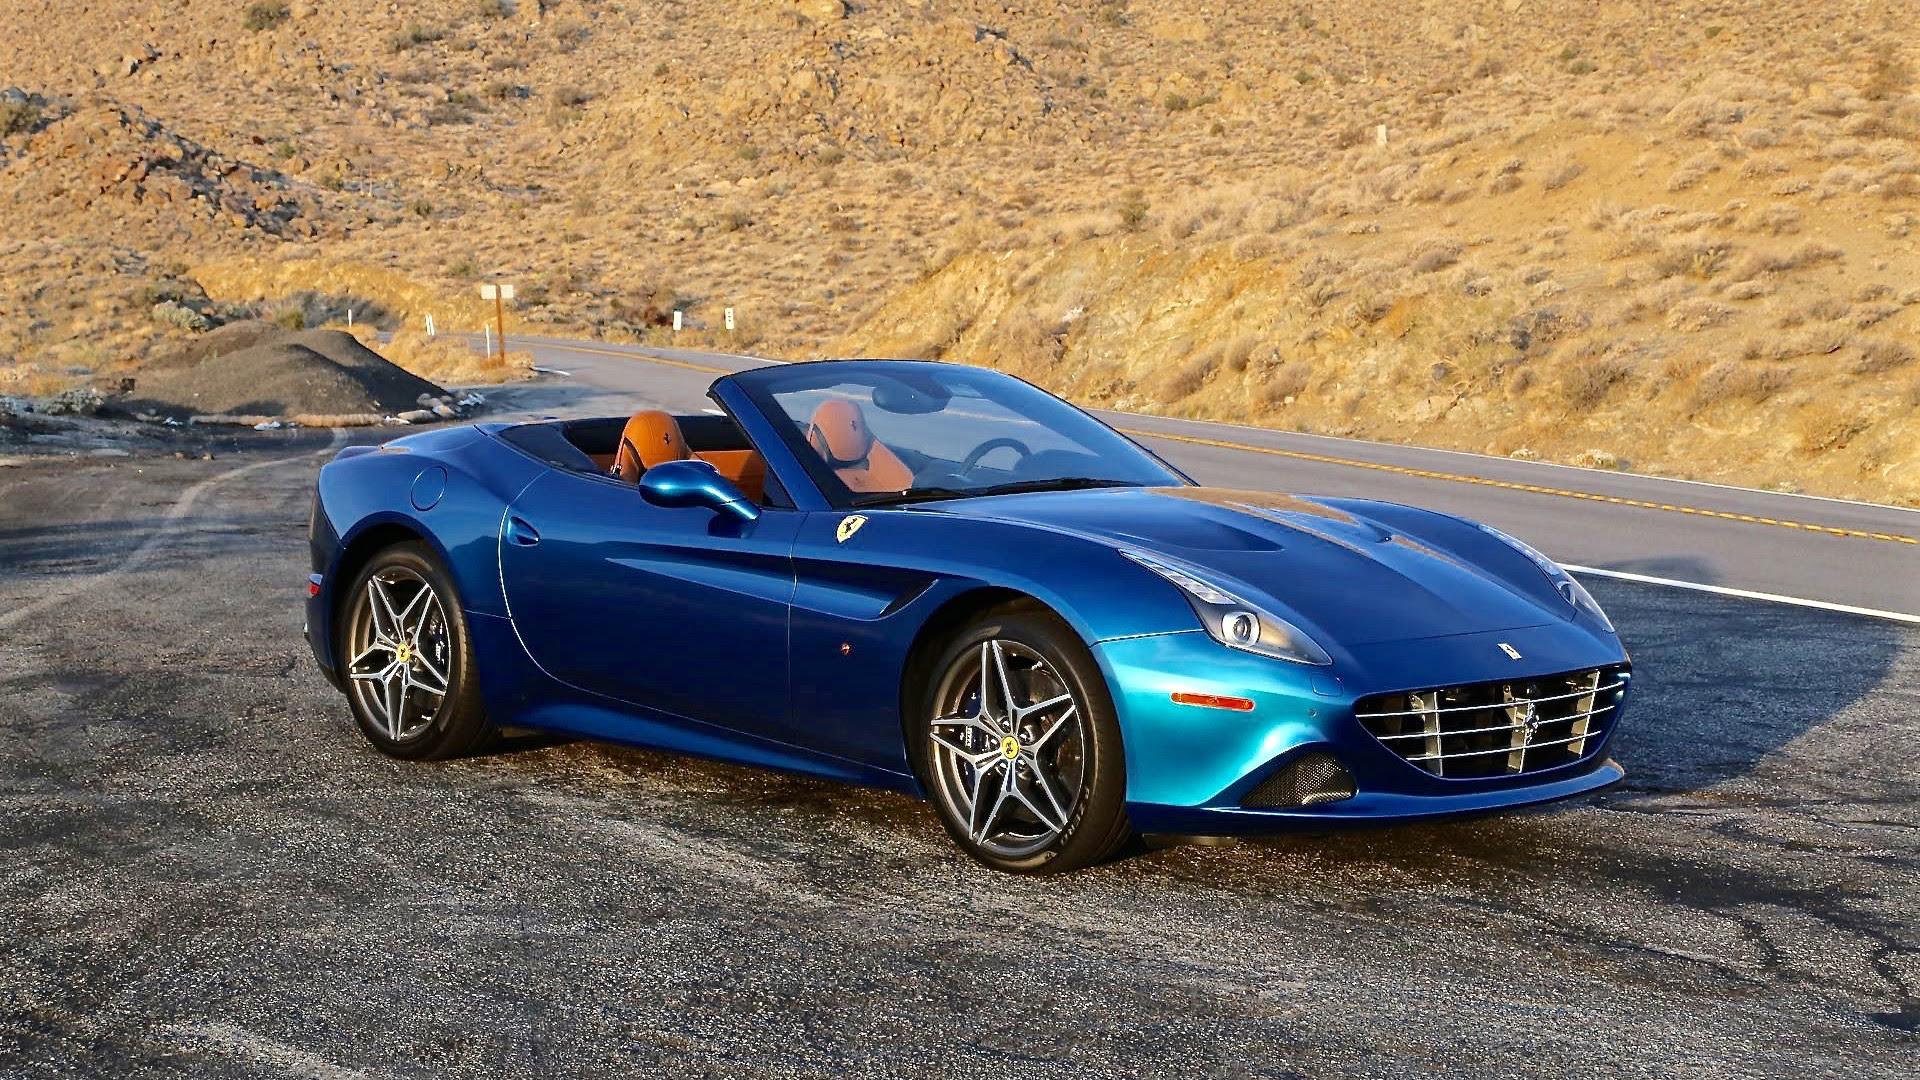 2015 Ferrari California T joy ride (Page 2)